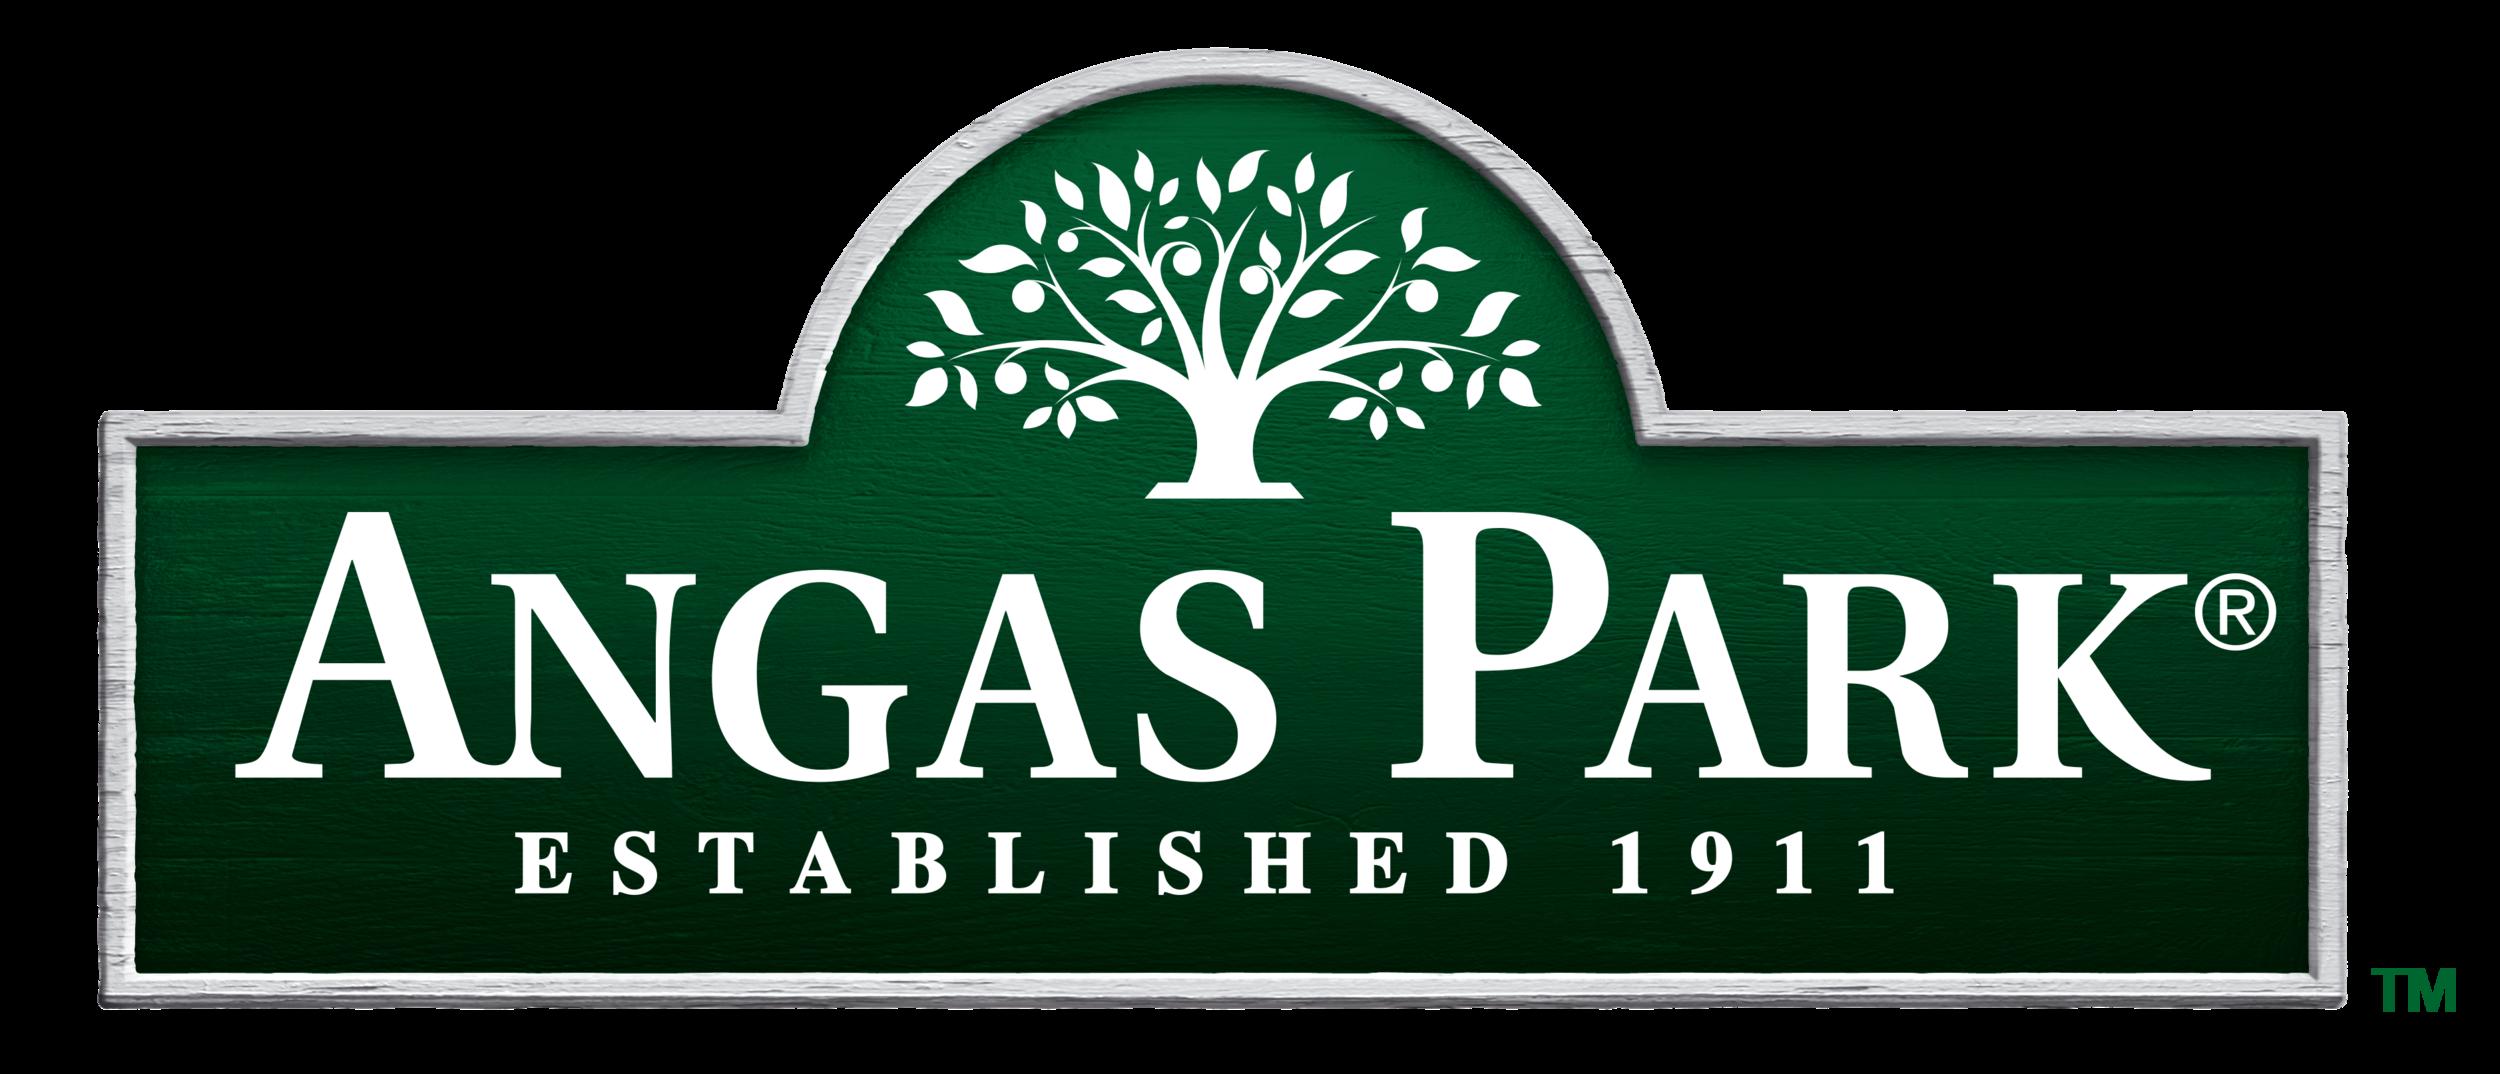 Angas Park Logo 2014.png